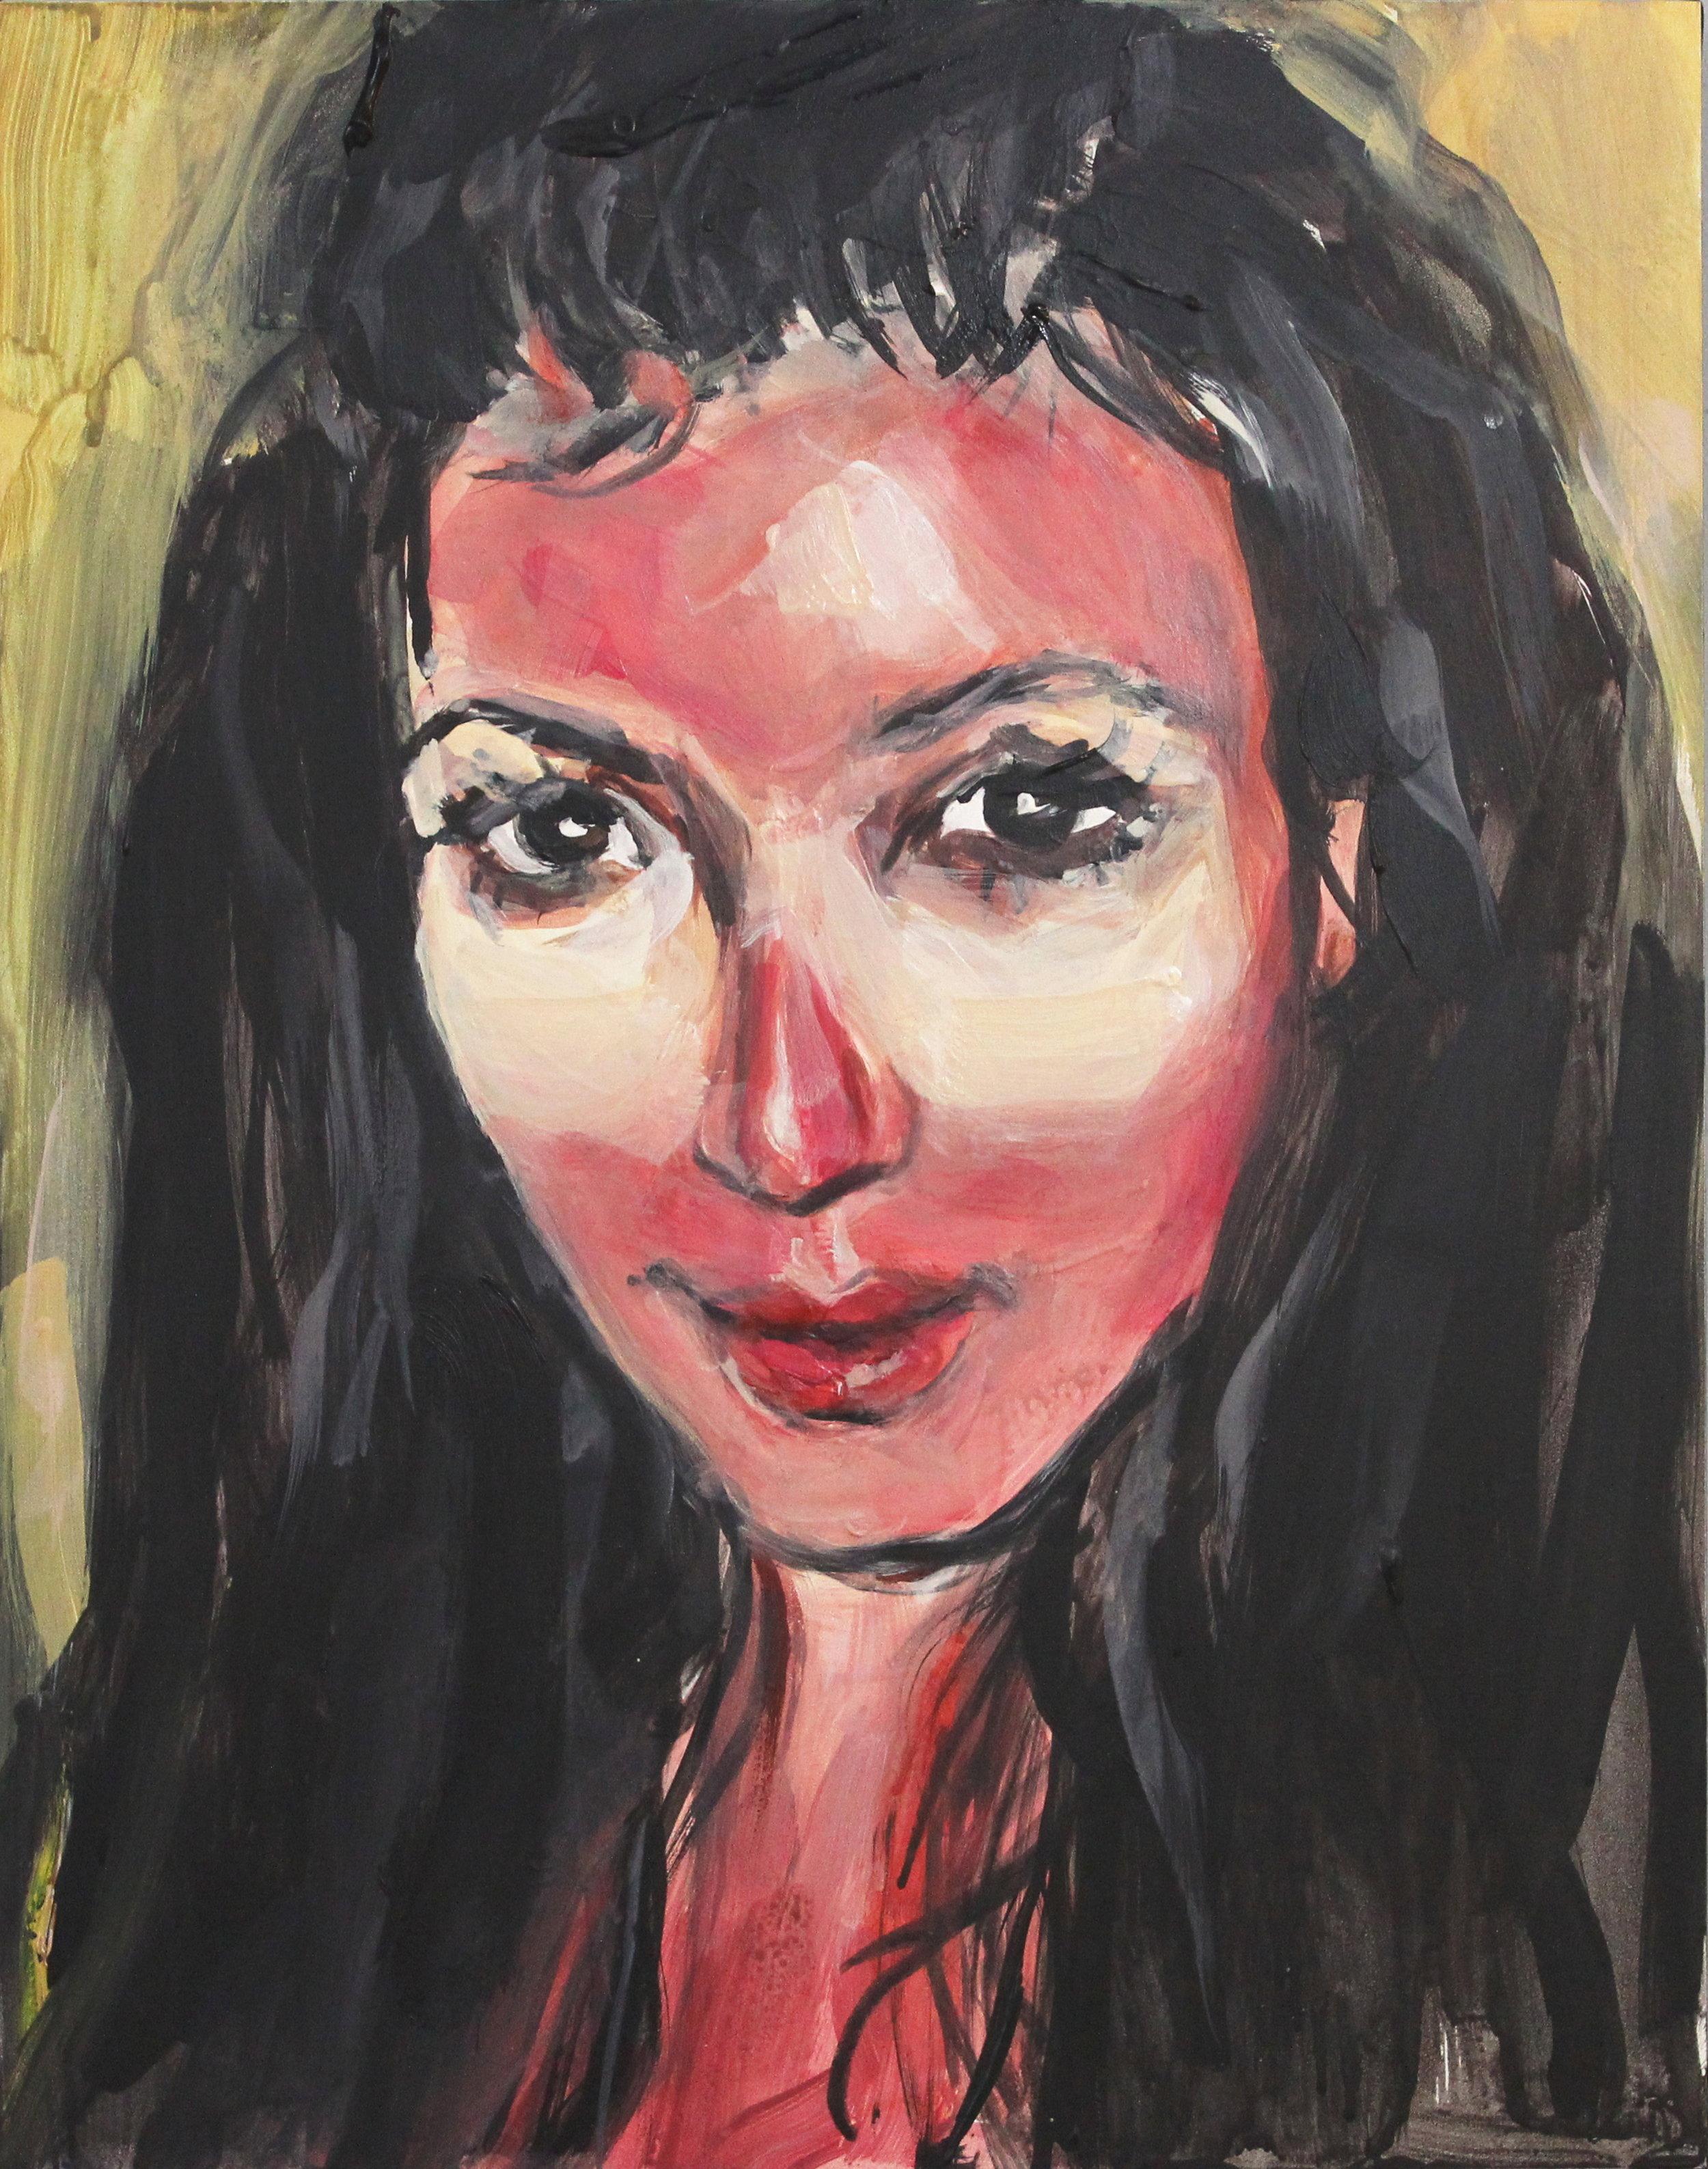 "Kim Kardashian With a Sunburn  11"" x 14"" acrylic on panel"